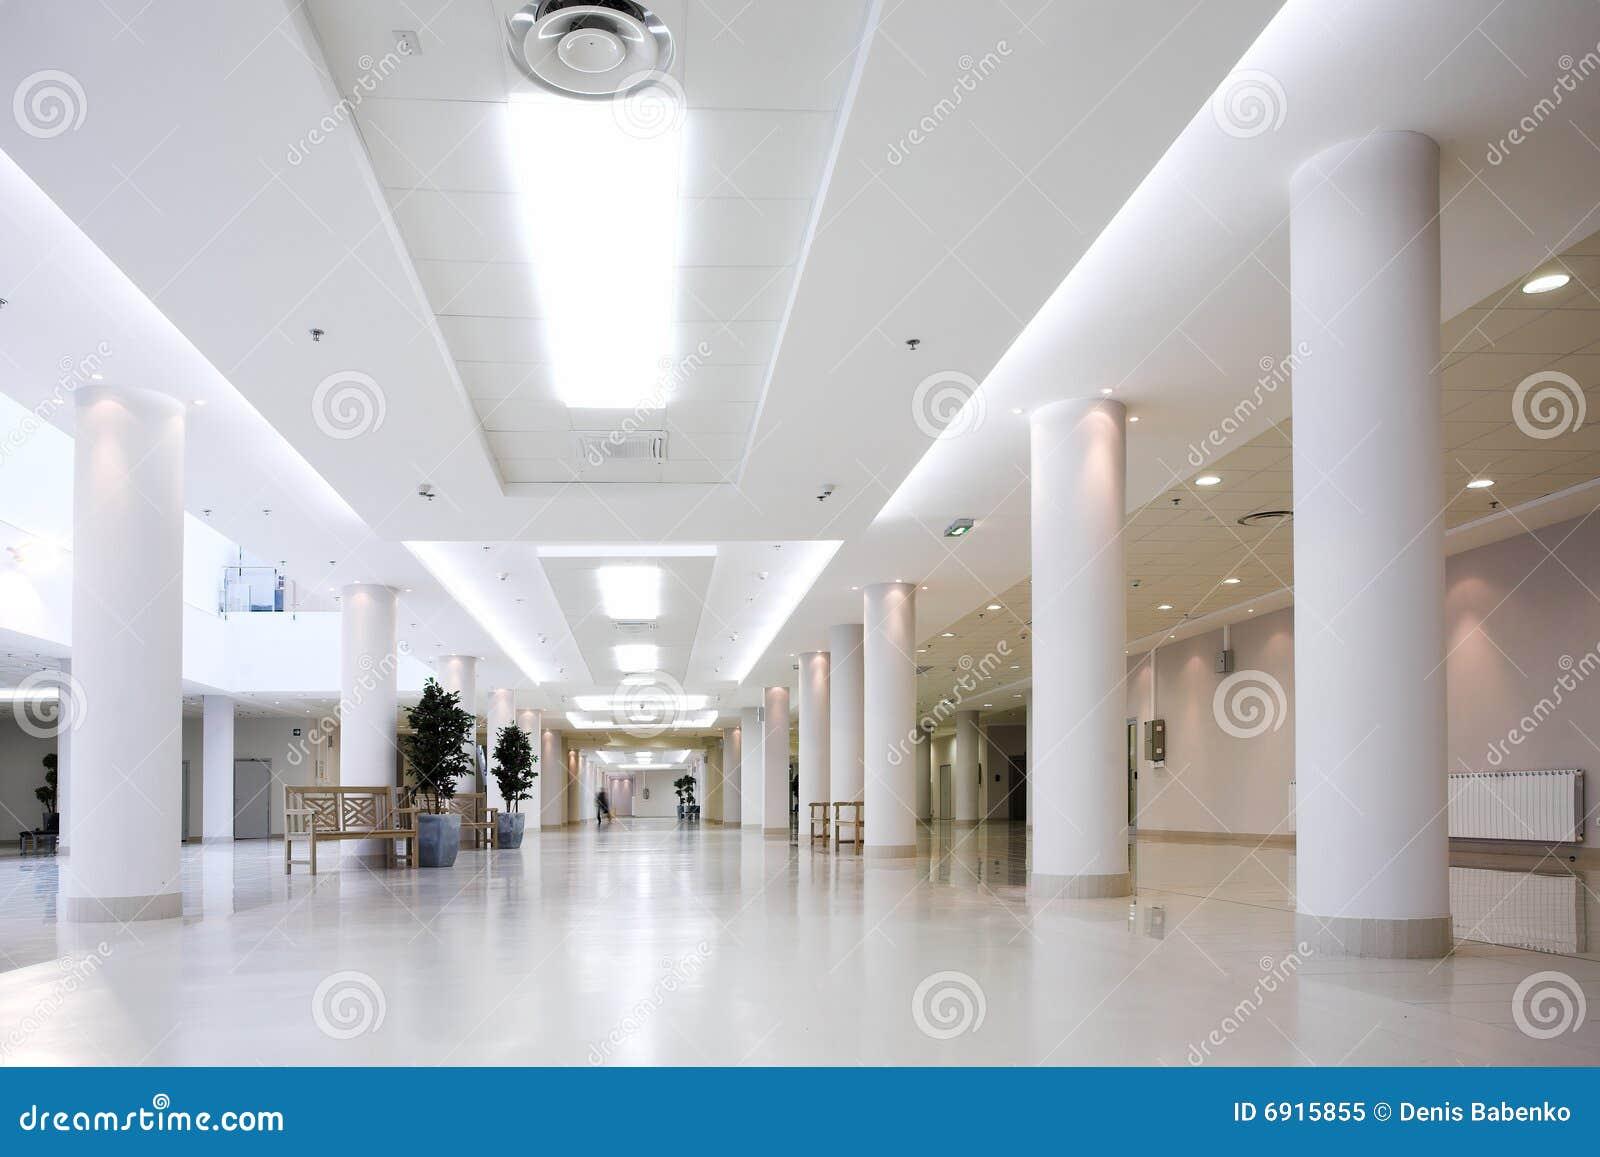 White Hall Office Center